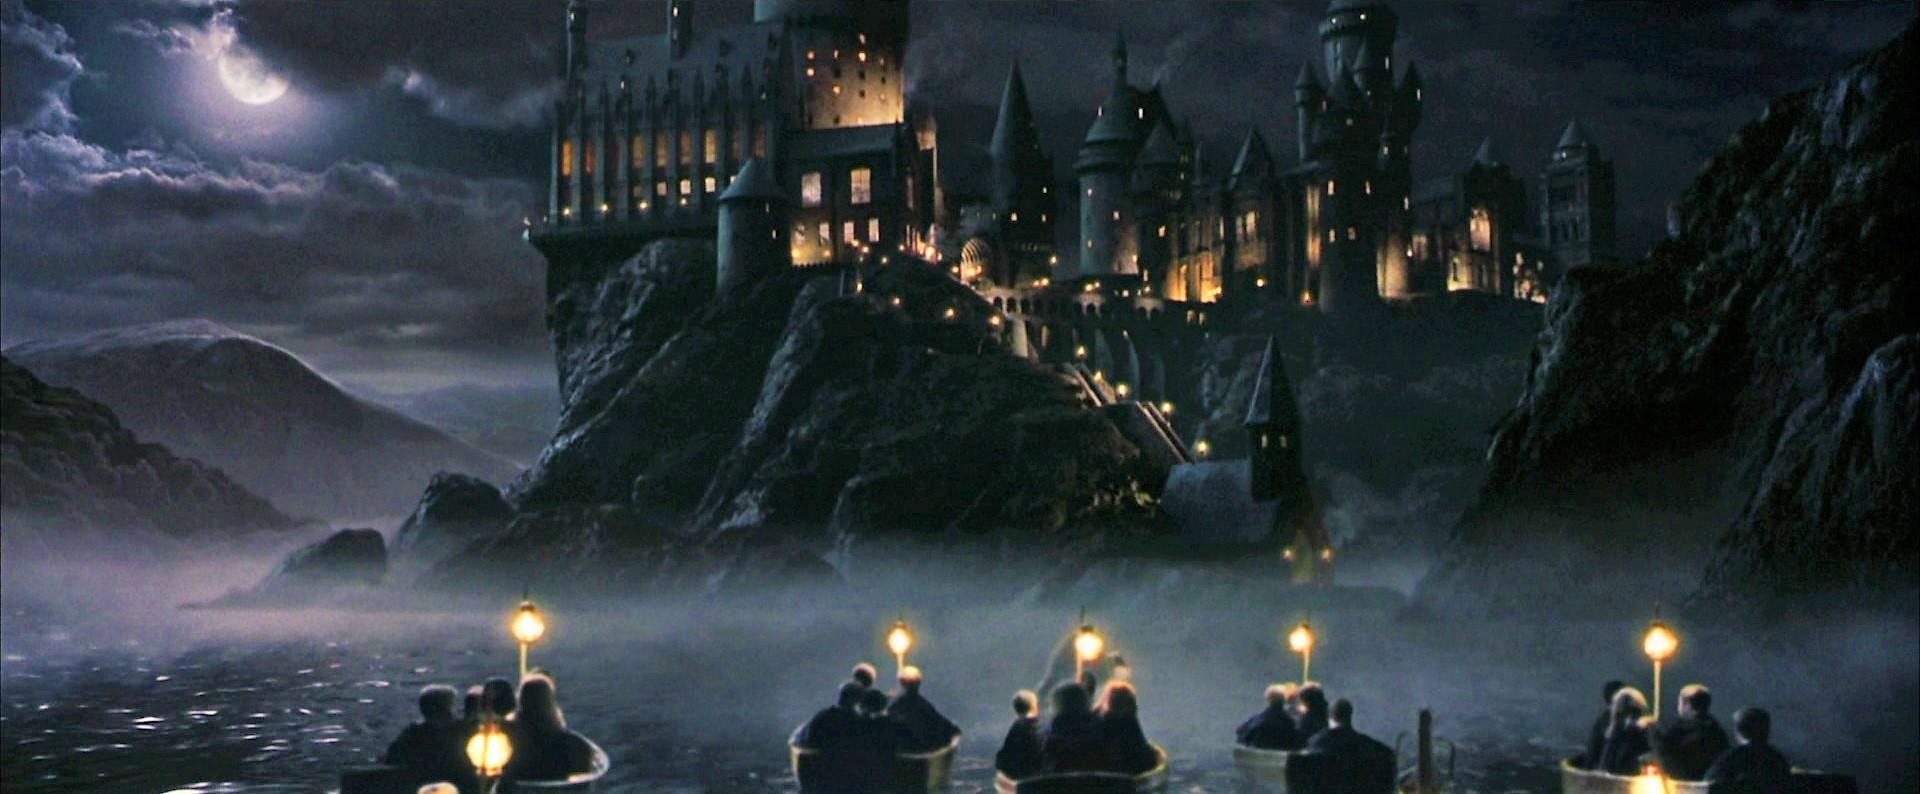 Hogwarts boats 1.jpg